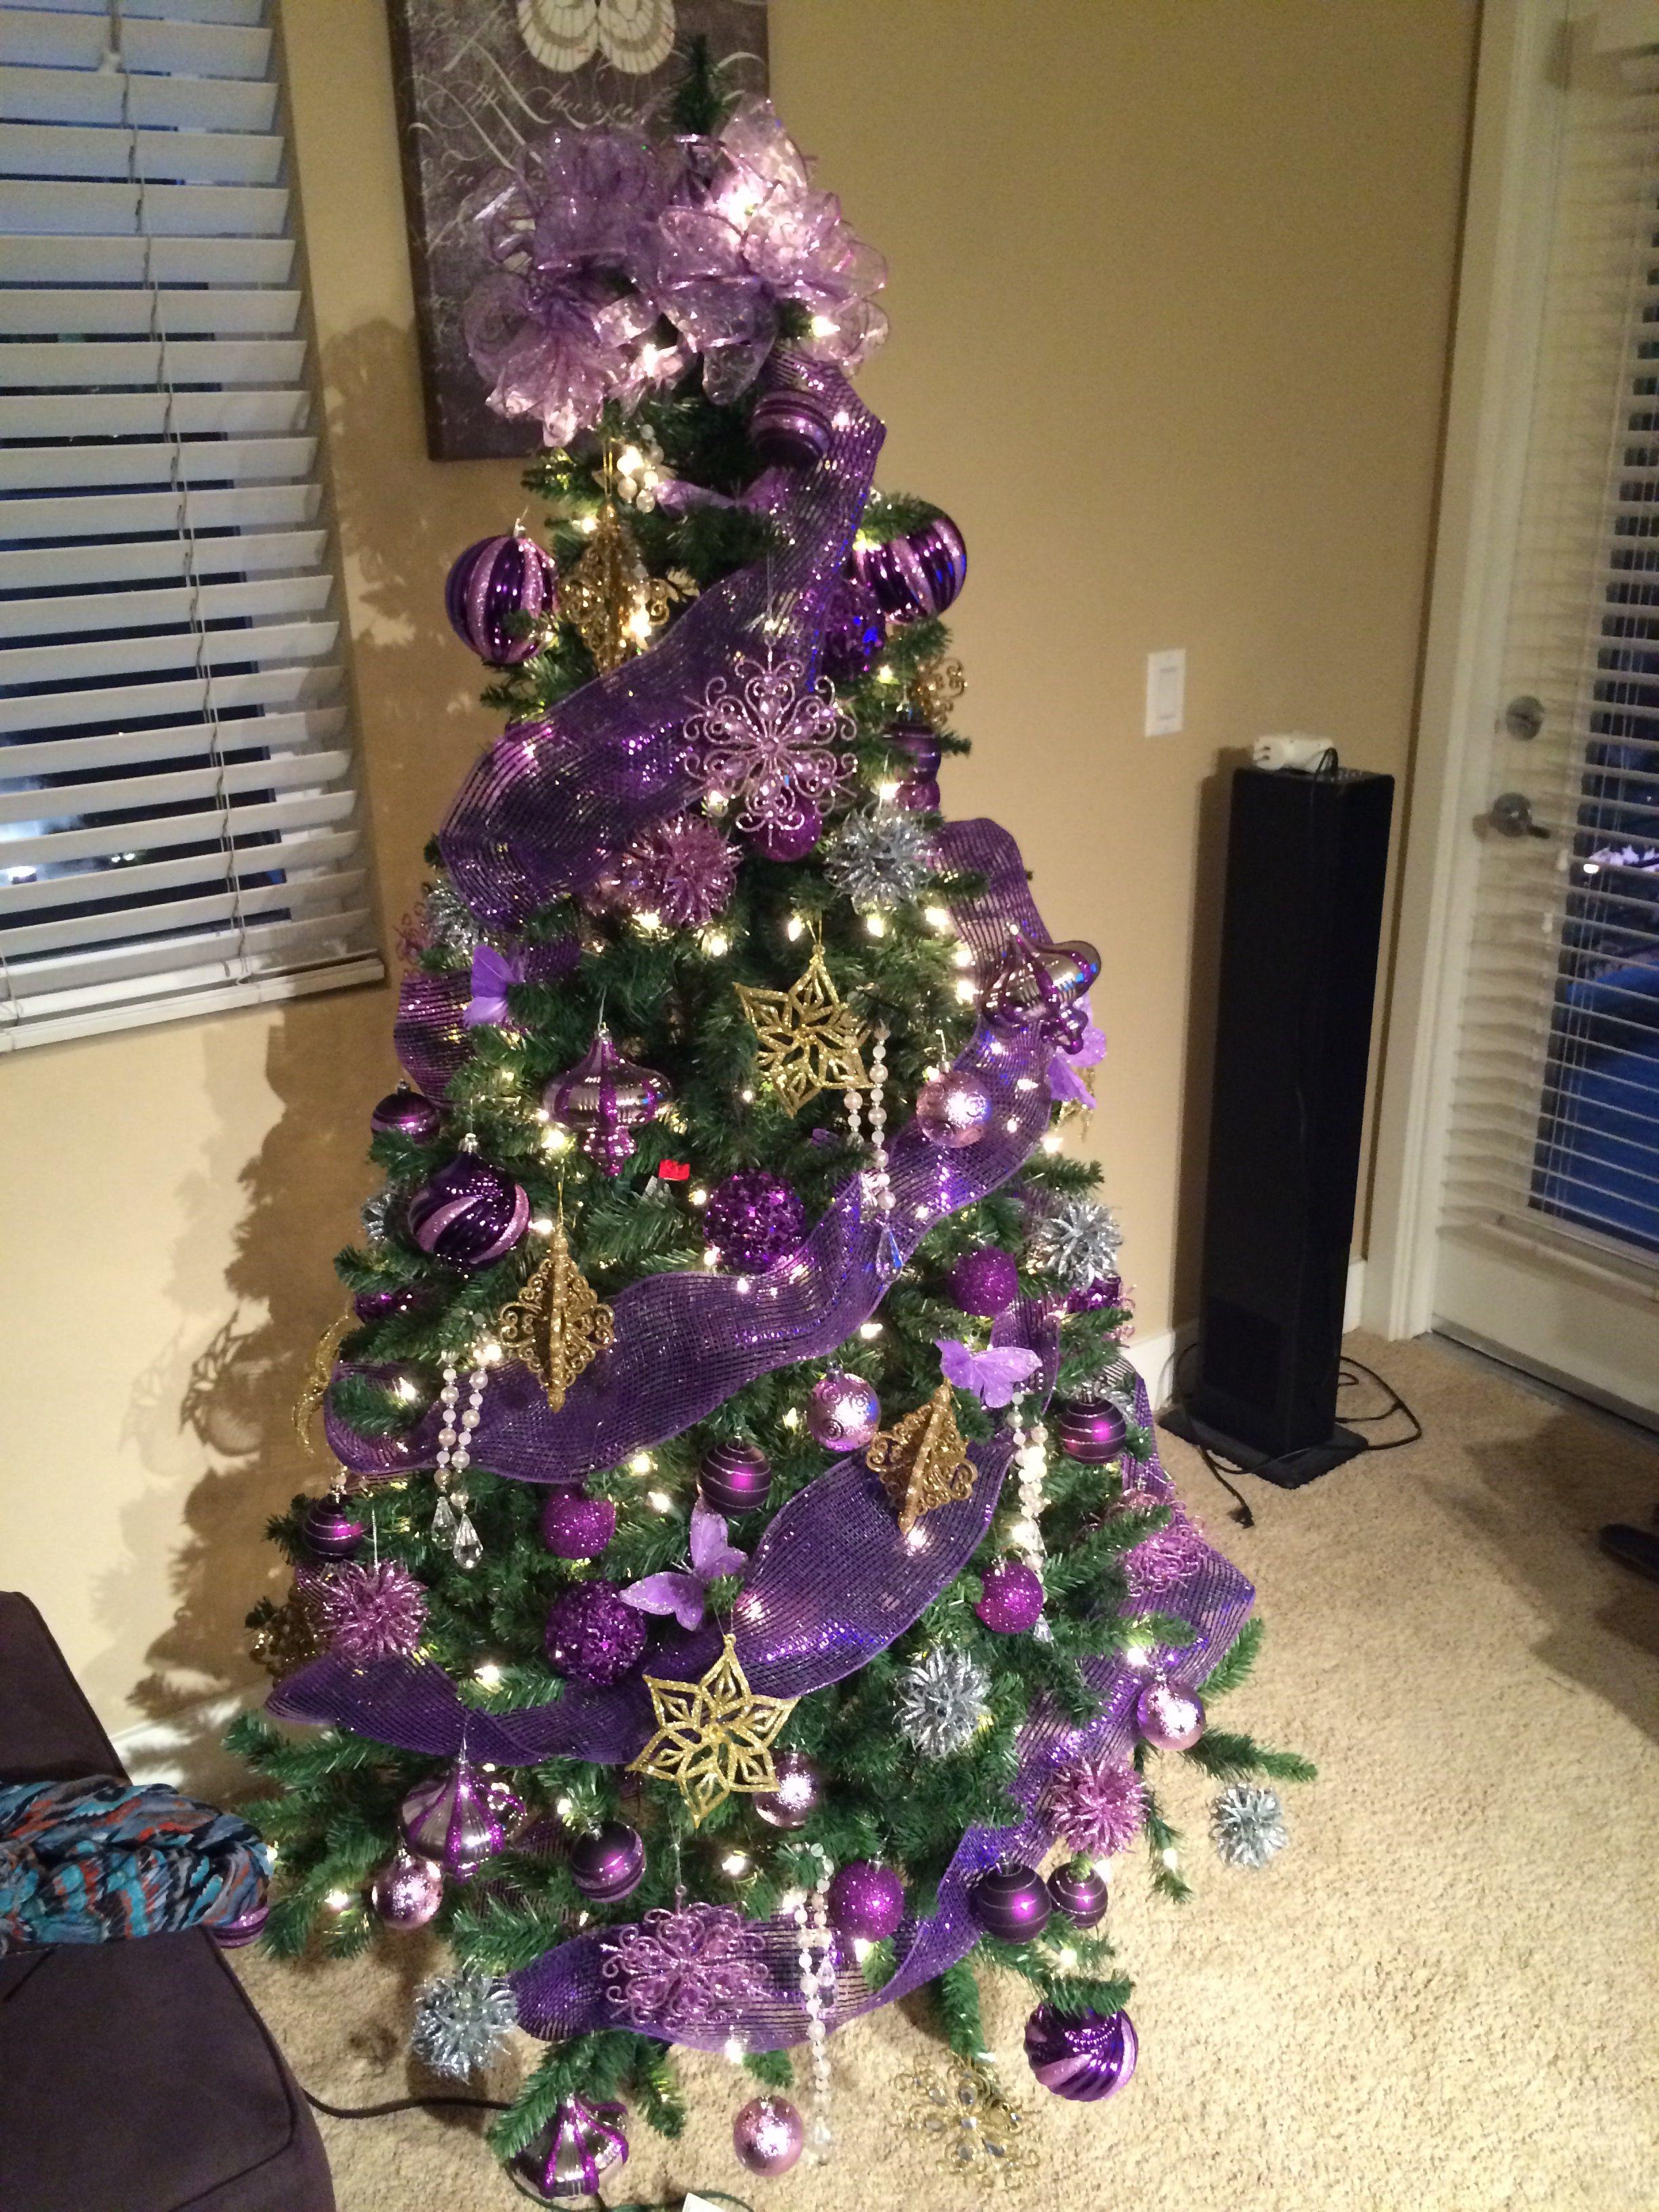 Purple Gold And Silver This Year We Dedicate Our Christmas Tree To The Ki Purple Christmas Tree Purple Christmas Decorations Christmas Tree Decorations Diy